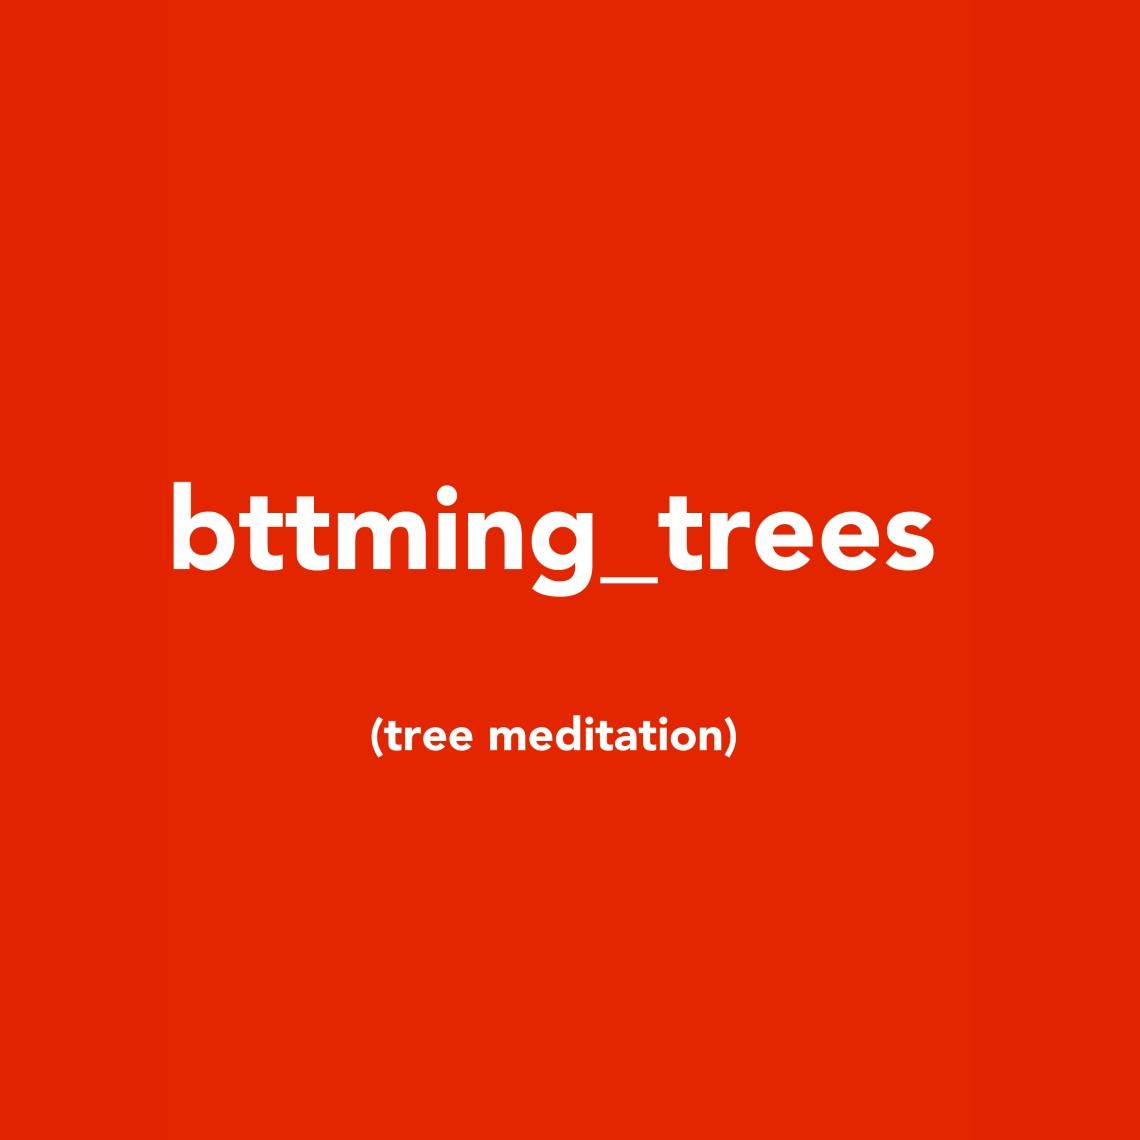 bttming trees